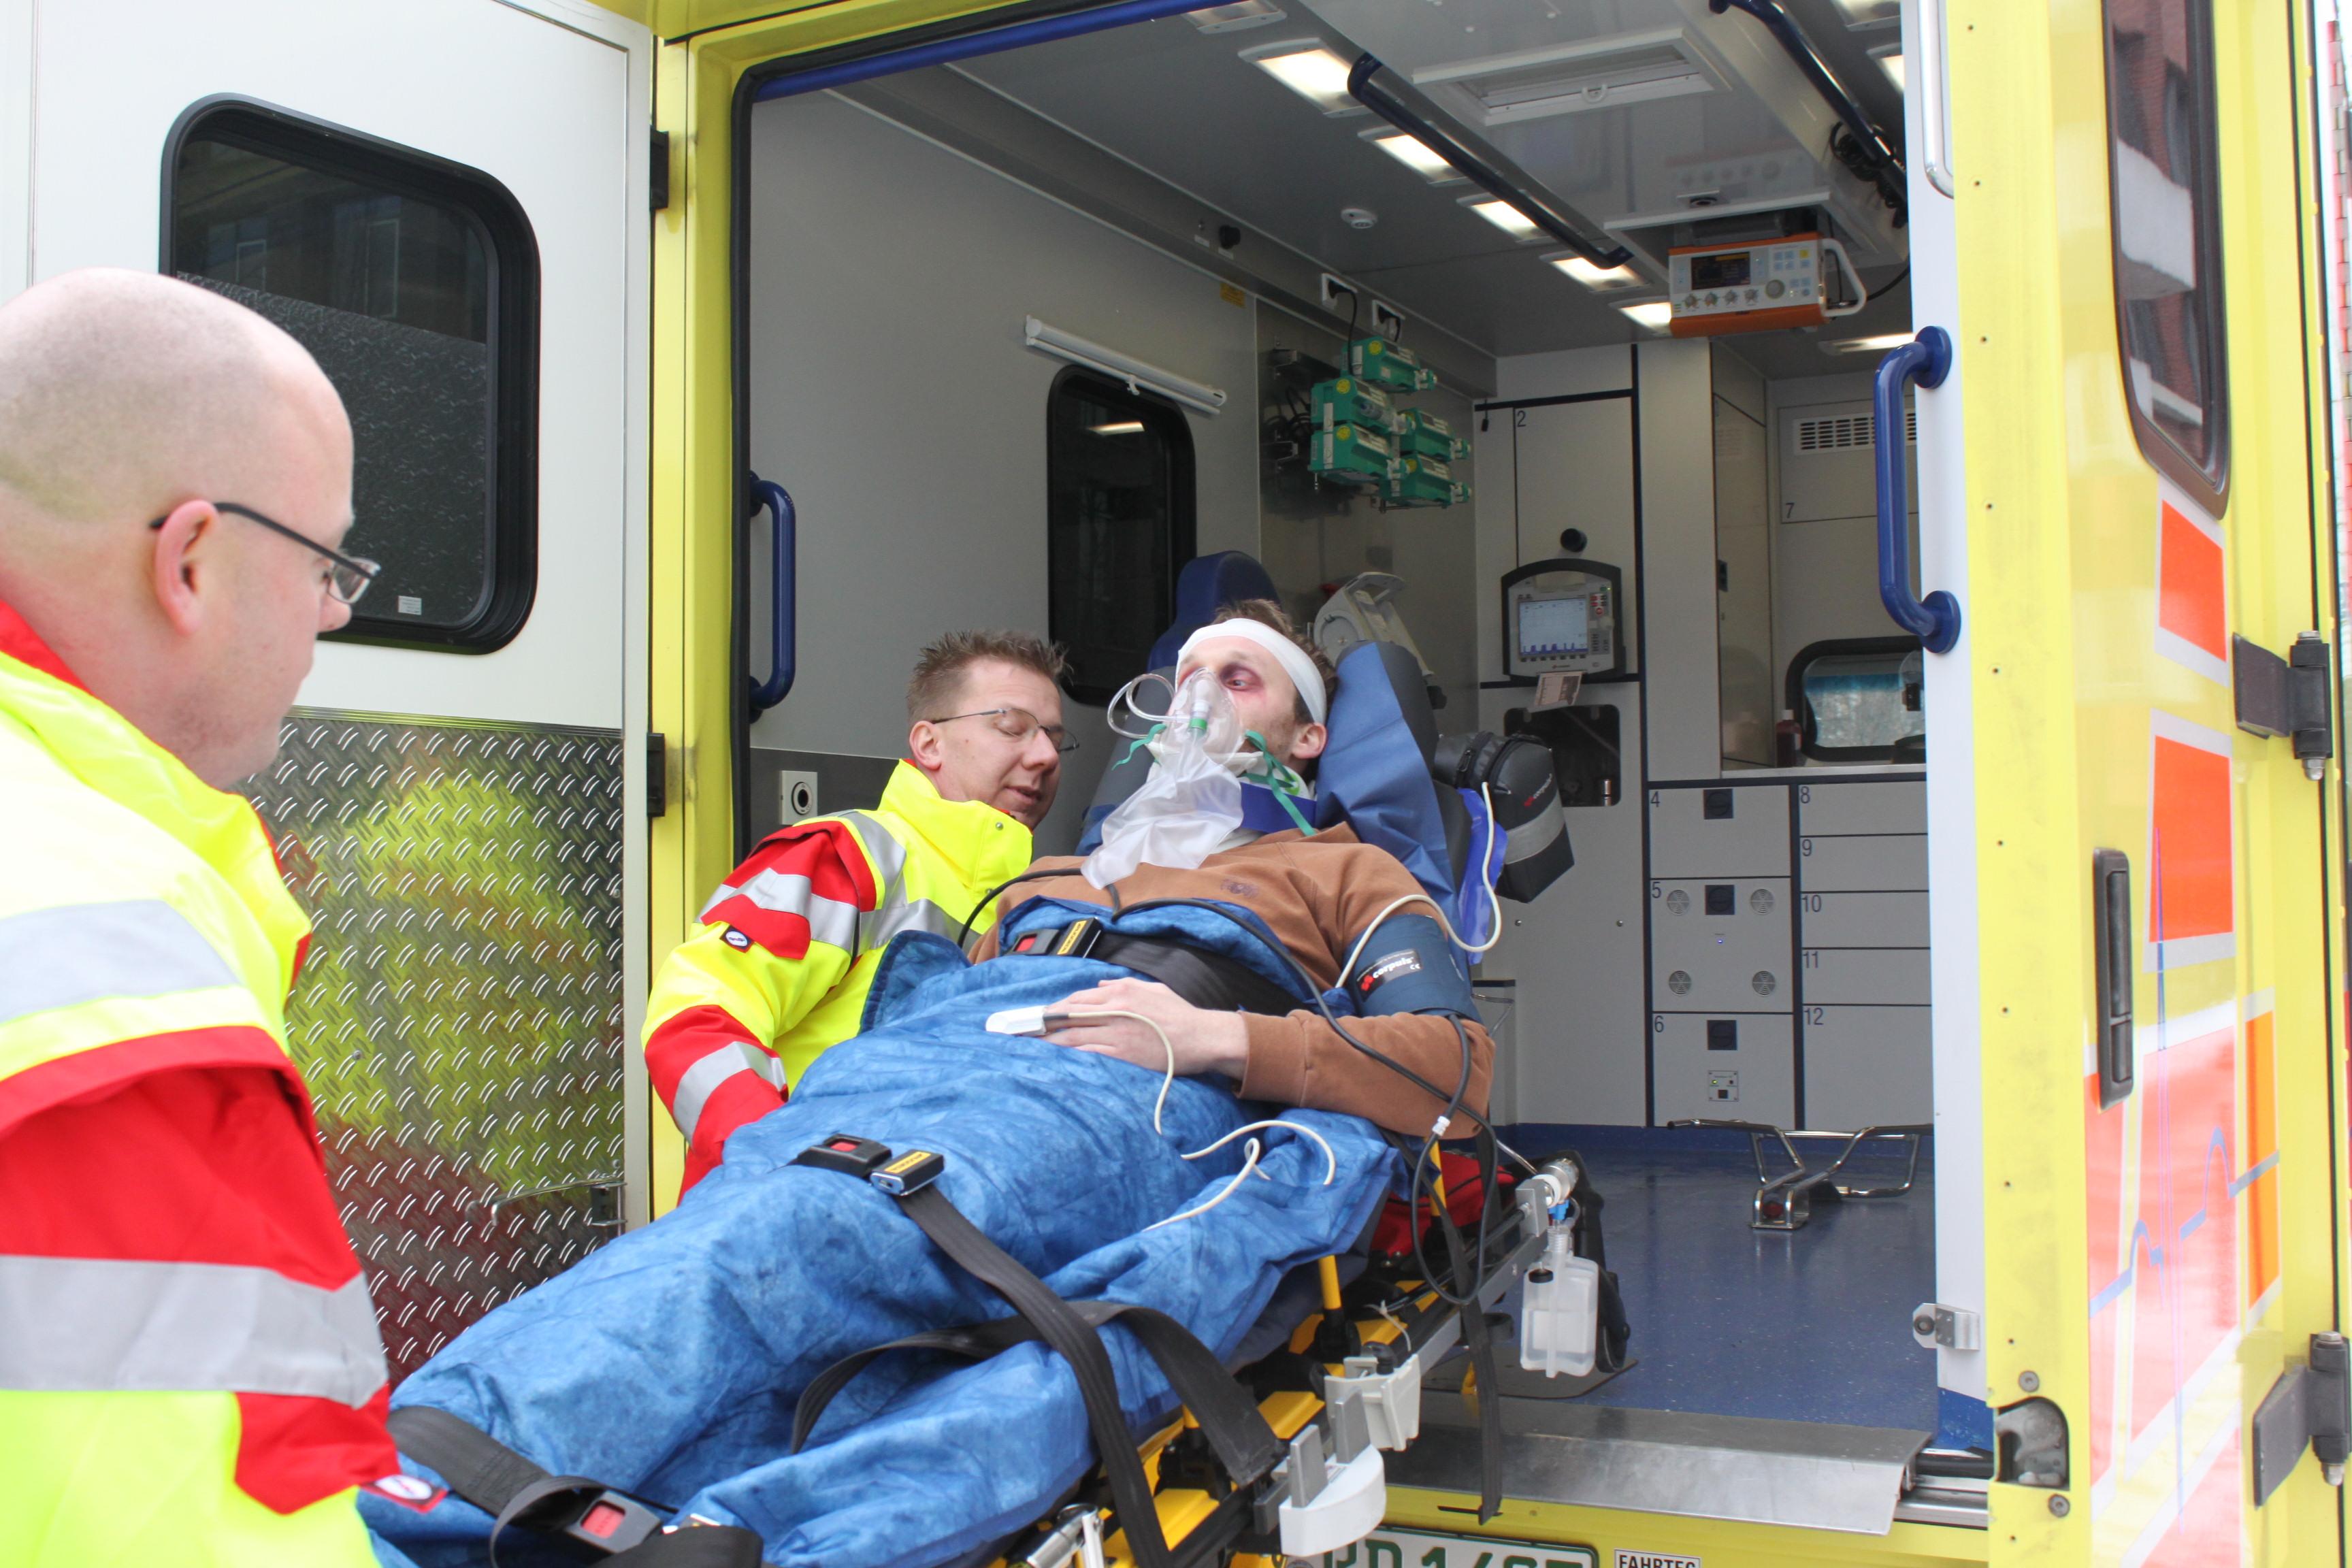 Rettungssanitäterin  Rettungssanitäterin und Rettungssanitäter